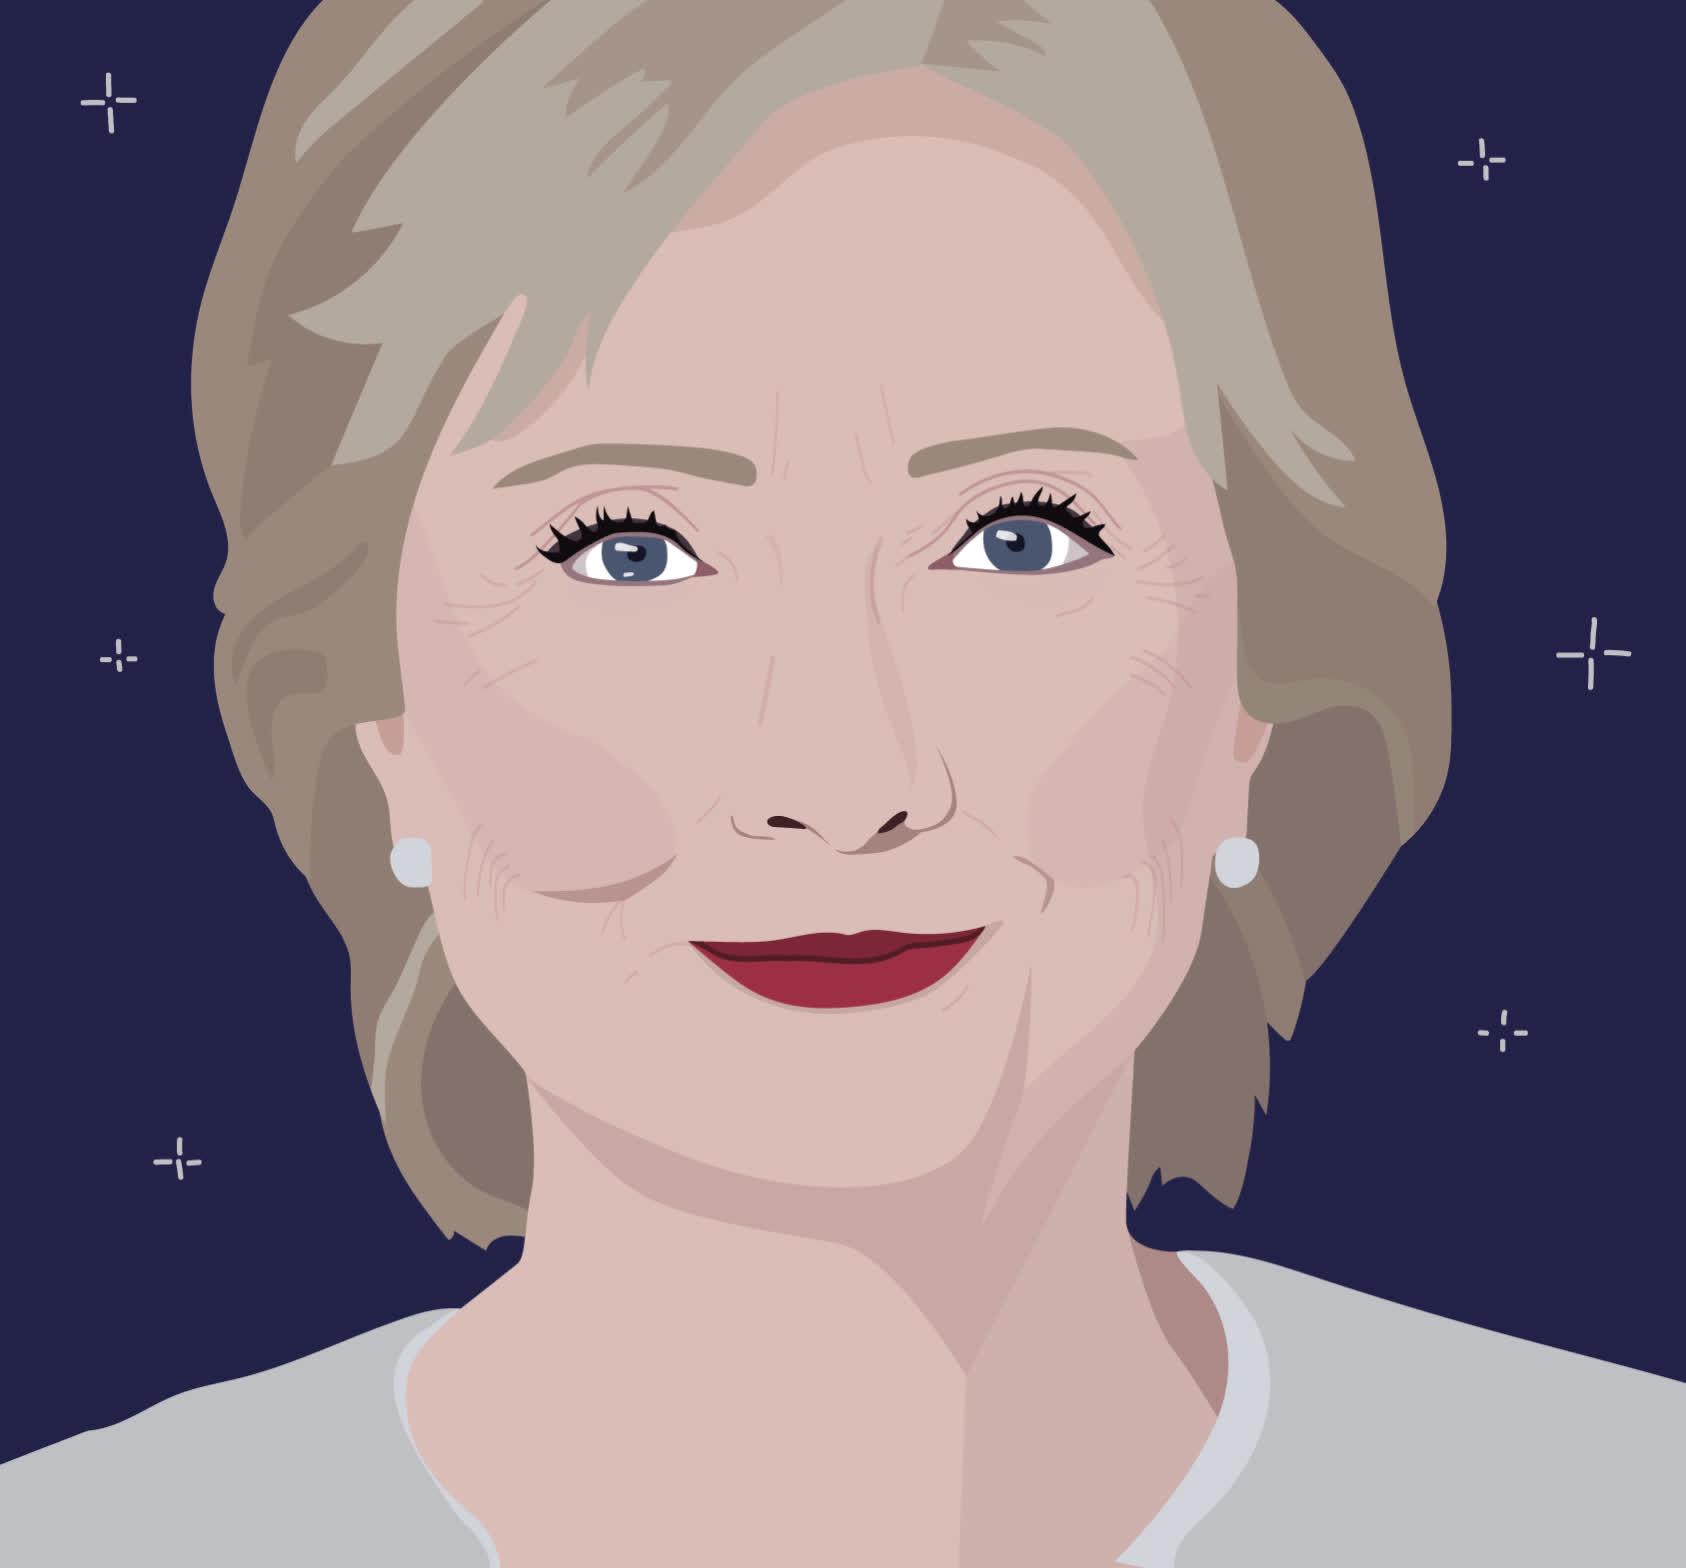 animation, hillary clinton, julie winegard, wink, Hillary Clinton Wink Animation GIFs